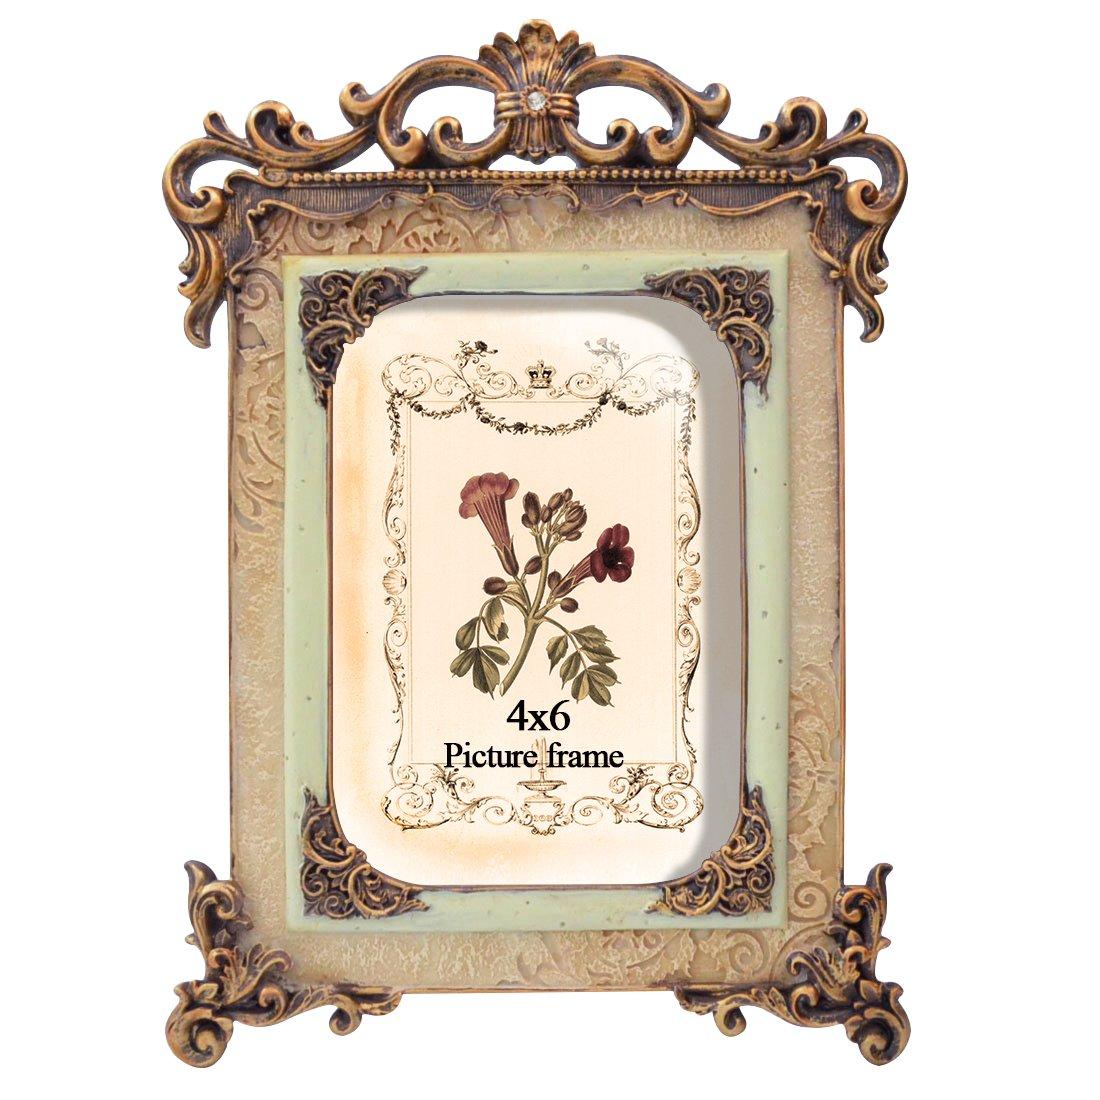 PETAFLOP picture frames 4 by 6 Inch Vintage Picture Frame Friends Gift Photo Display 4x6 PETAFLOPS IMP 4x6CH180303